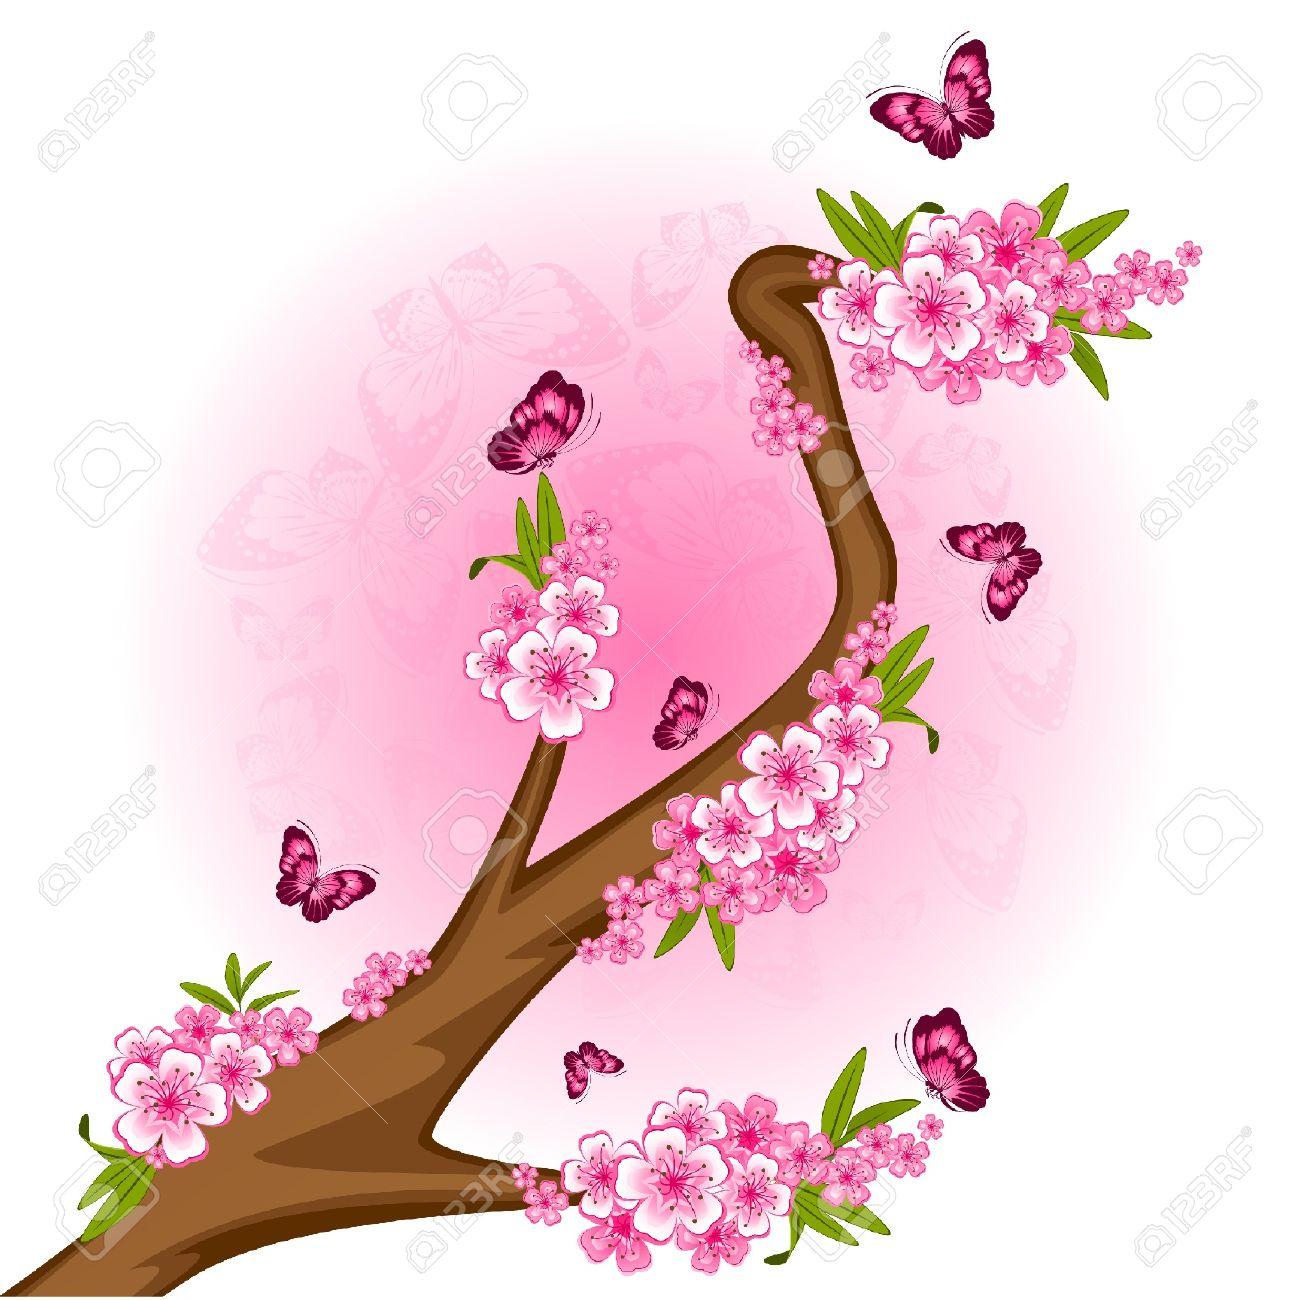 Beautiful Drawings Of Butterflies On Flowers Amazing Wallpapers